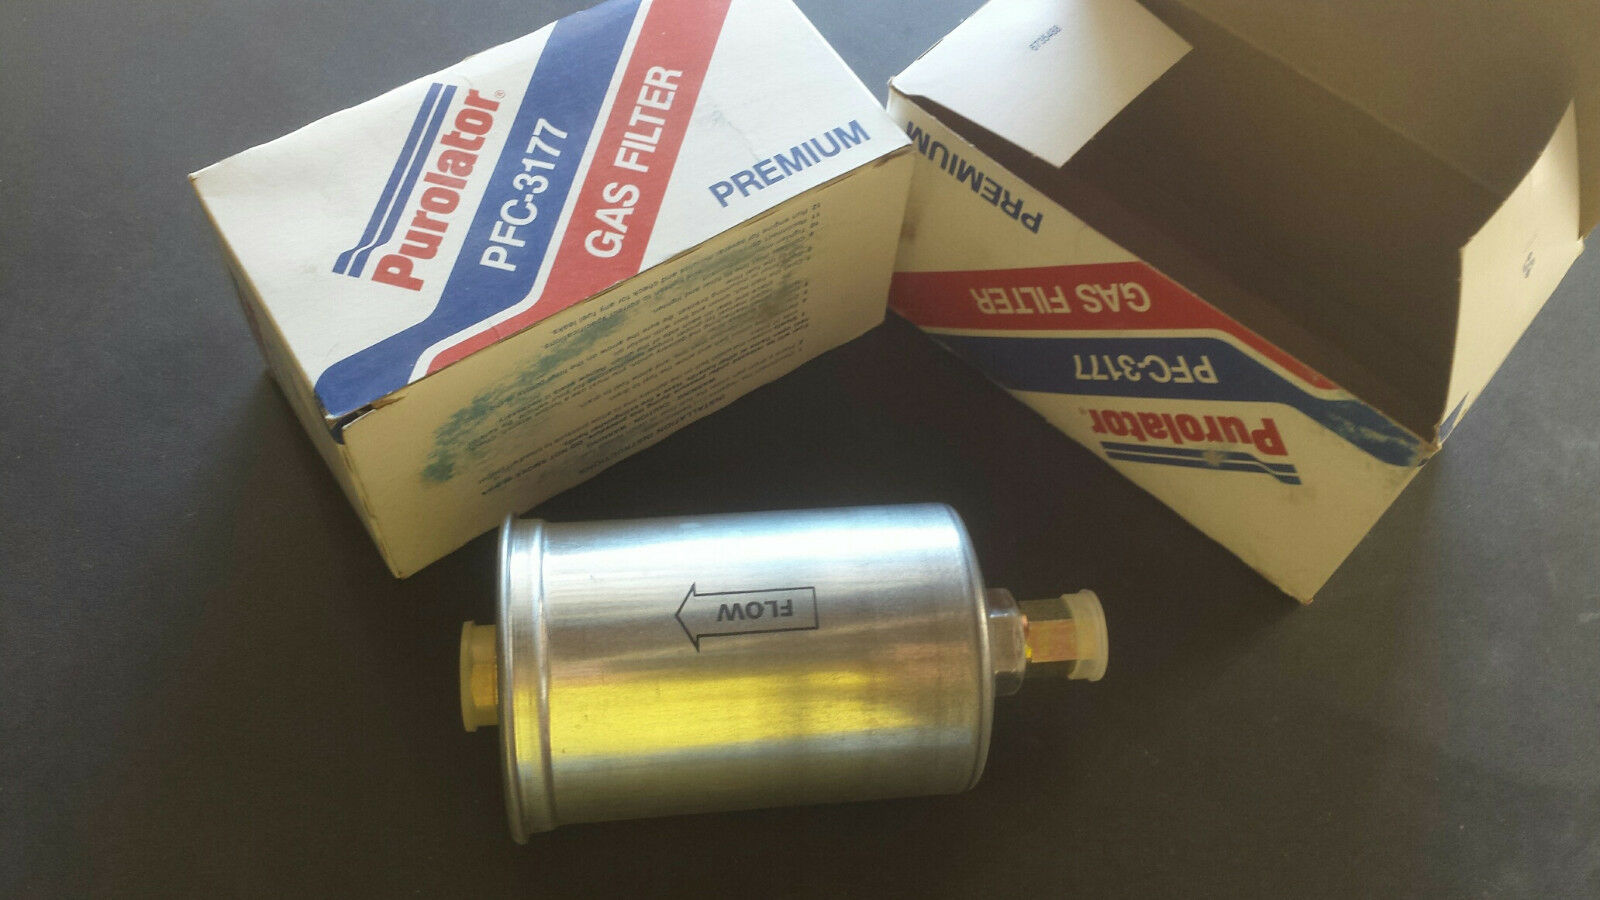 Used Volkswagen Fuel Filters For Sale Page 2 Purolator Gasoline Pfc 3177 Fits Audi Vw Saab Volvo Peugeot